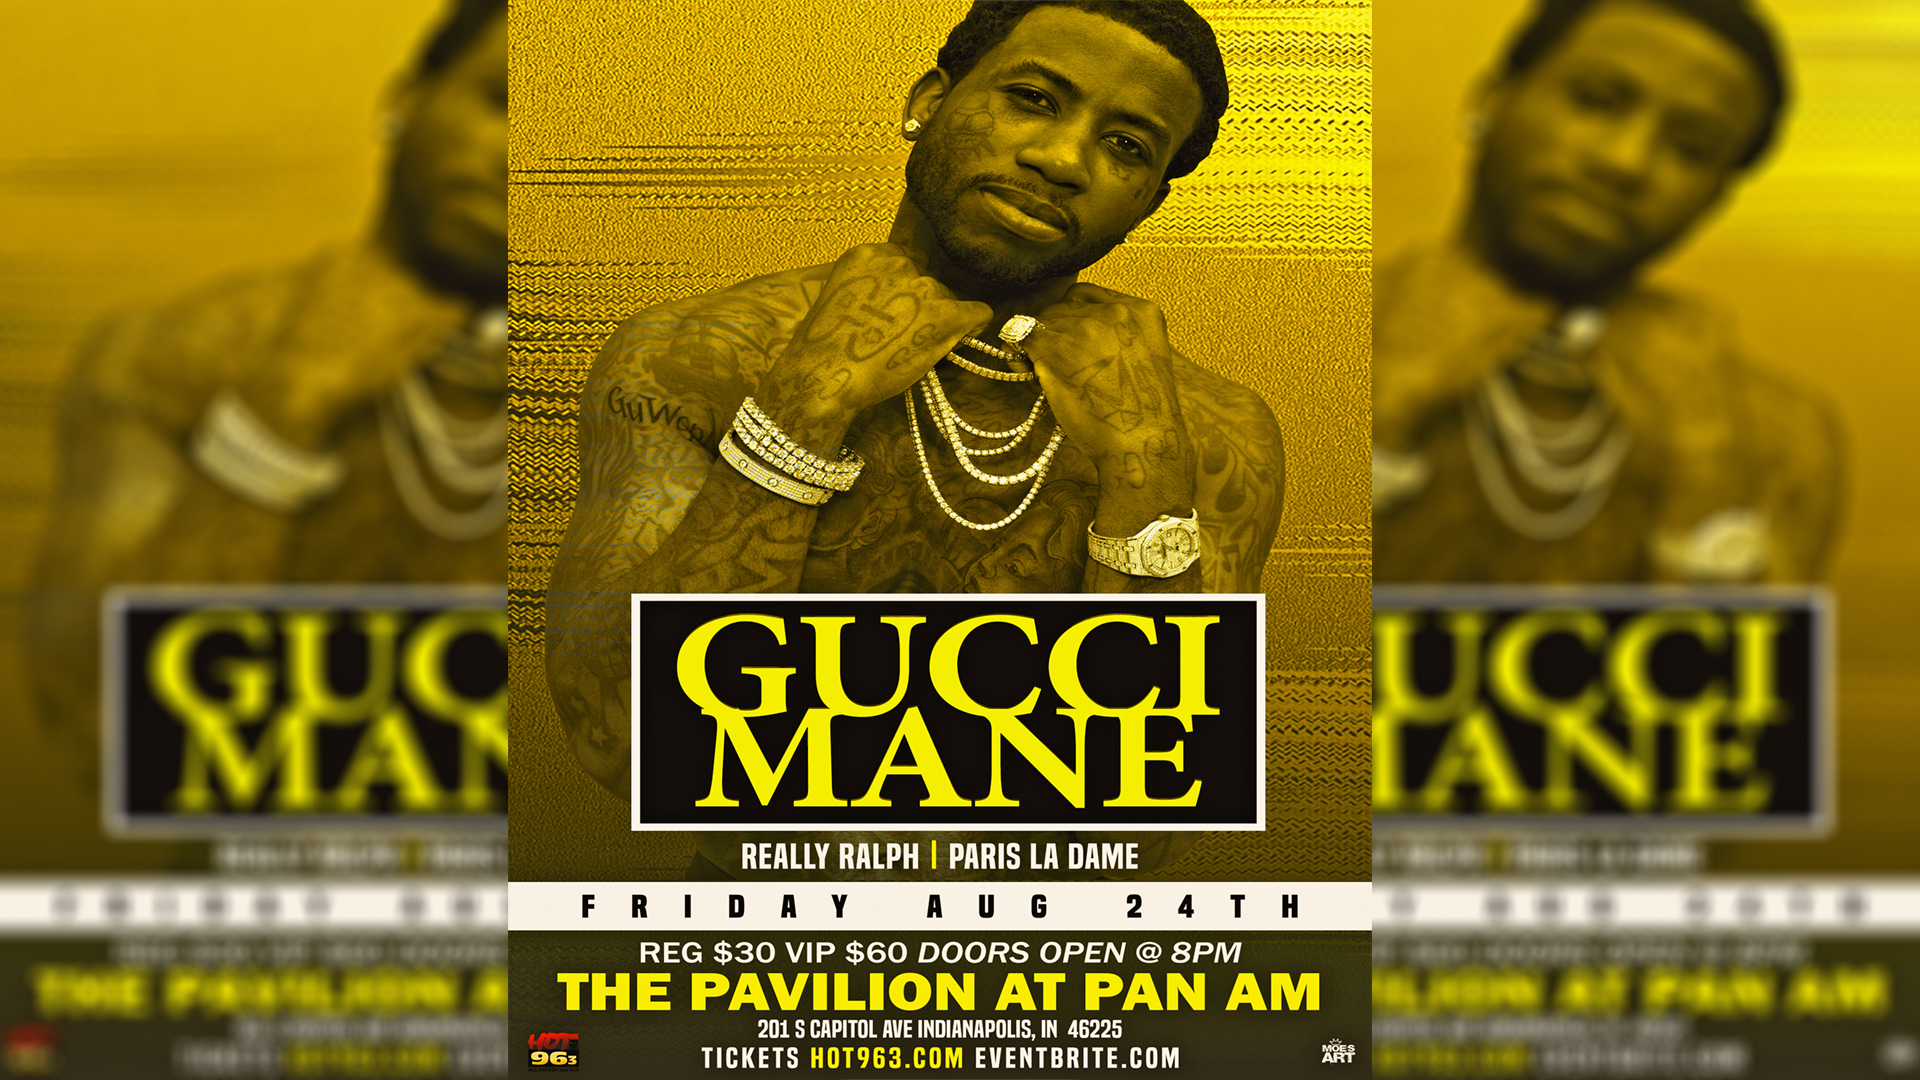 Gucci Mane Live at the Pavilion Flyer